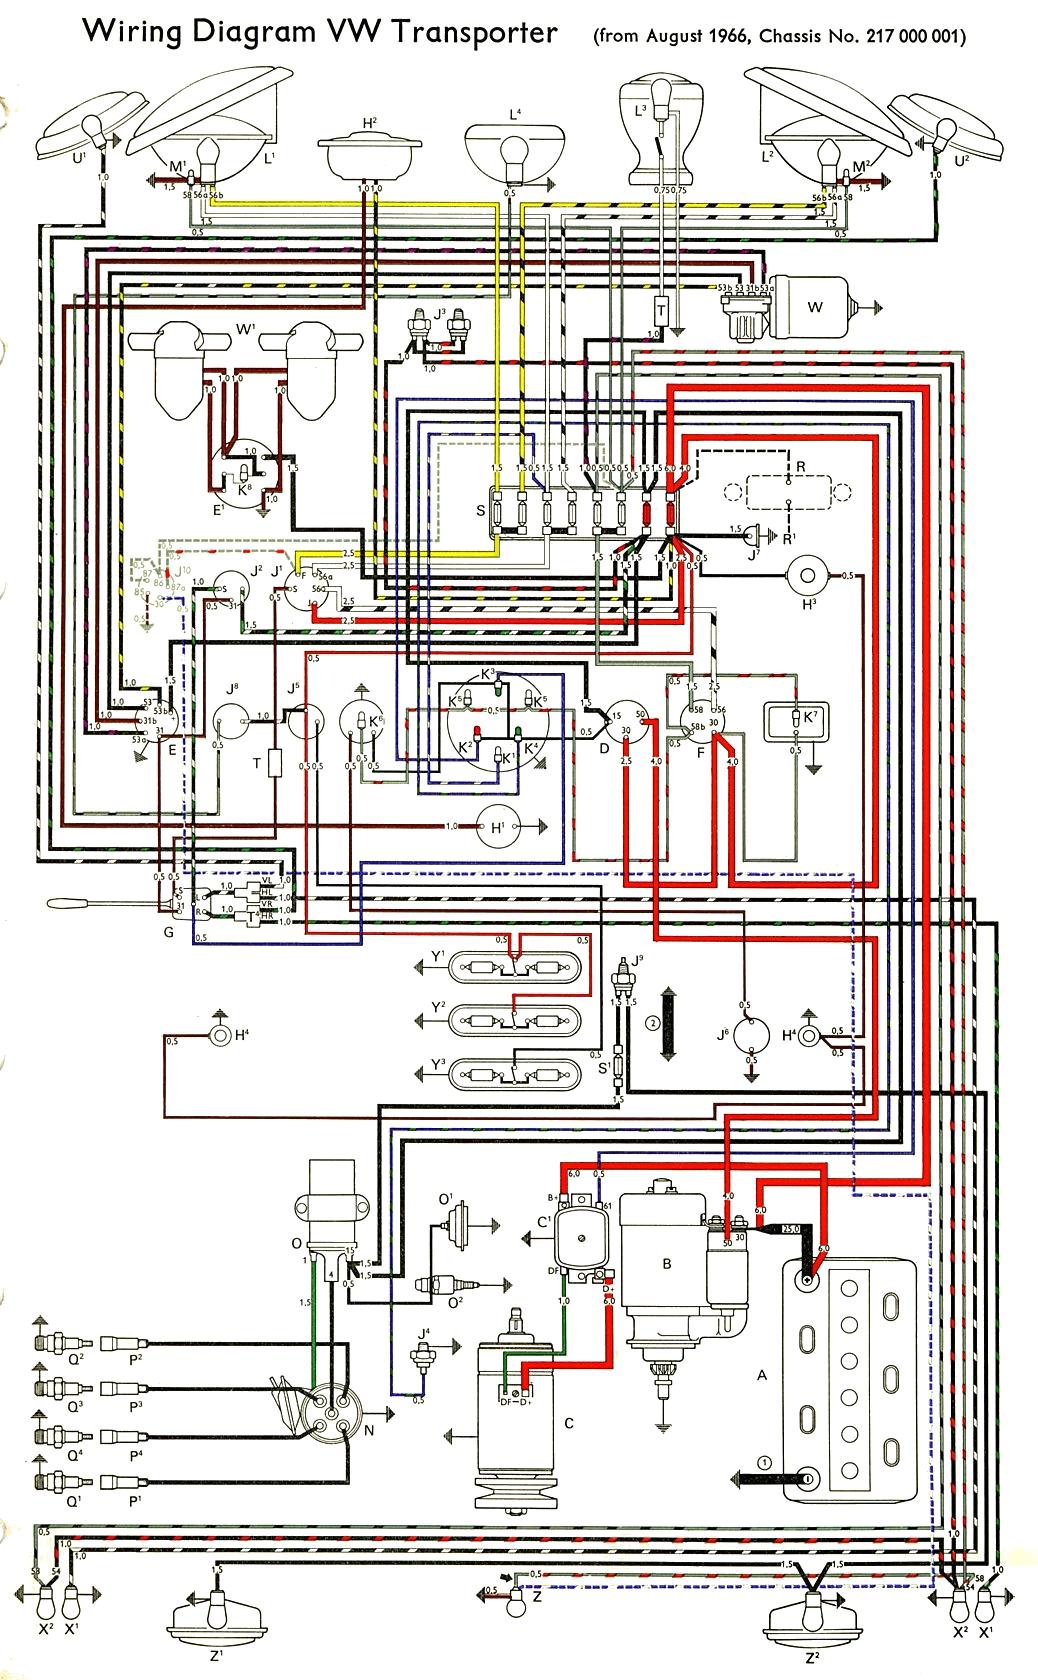 1973 Vw Super Beetle Fuse Box Diagrams 1966 Diagram